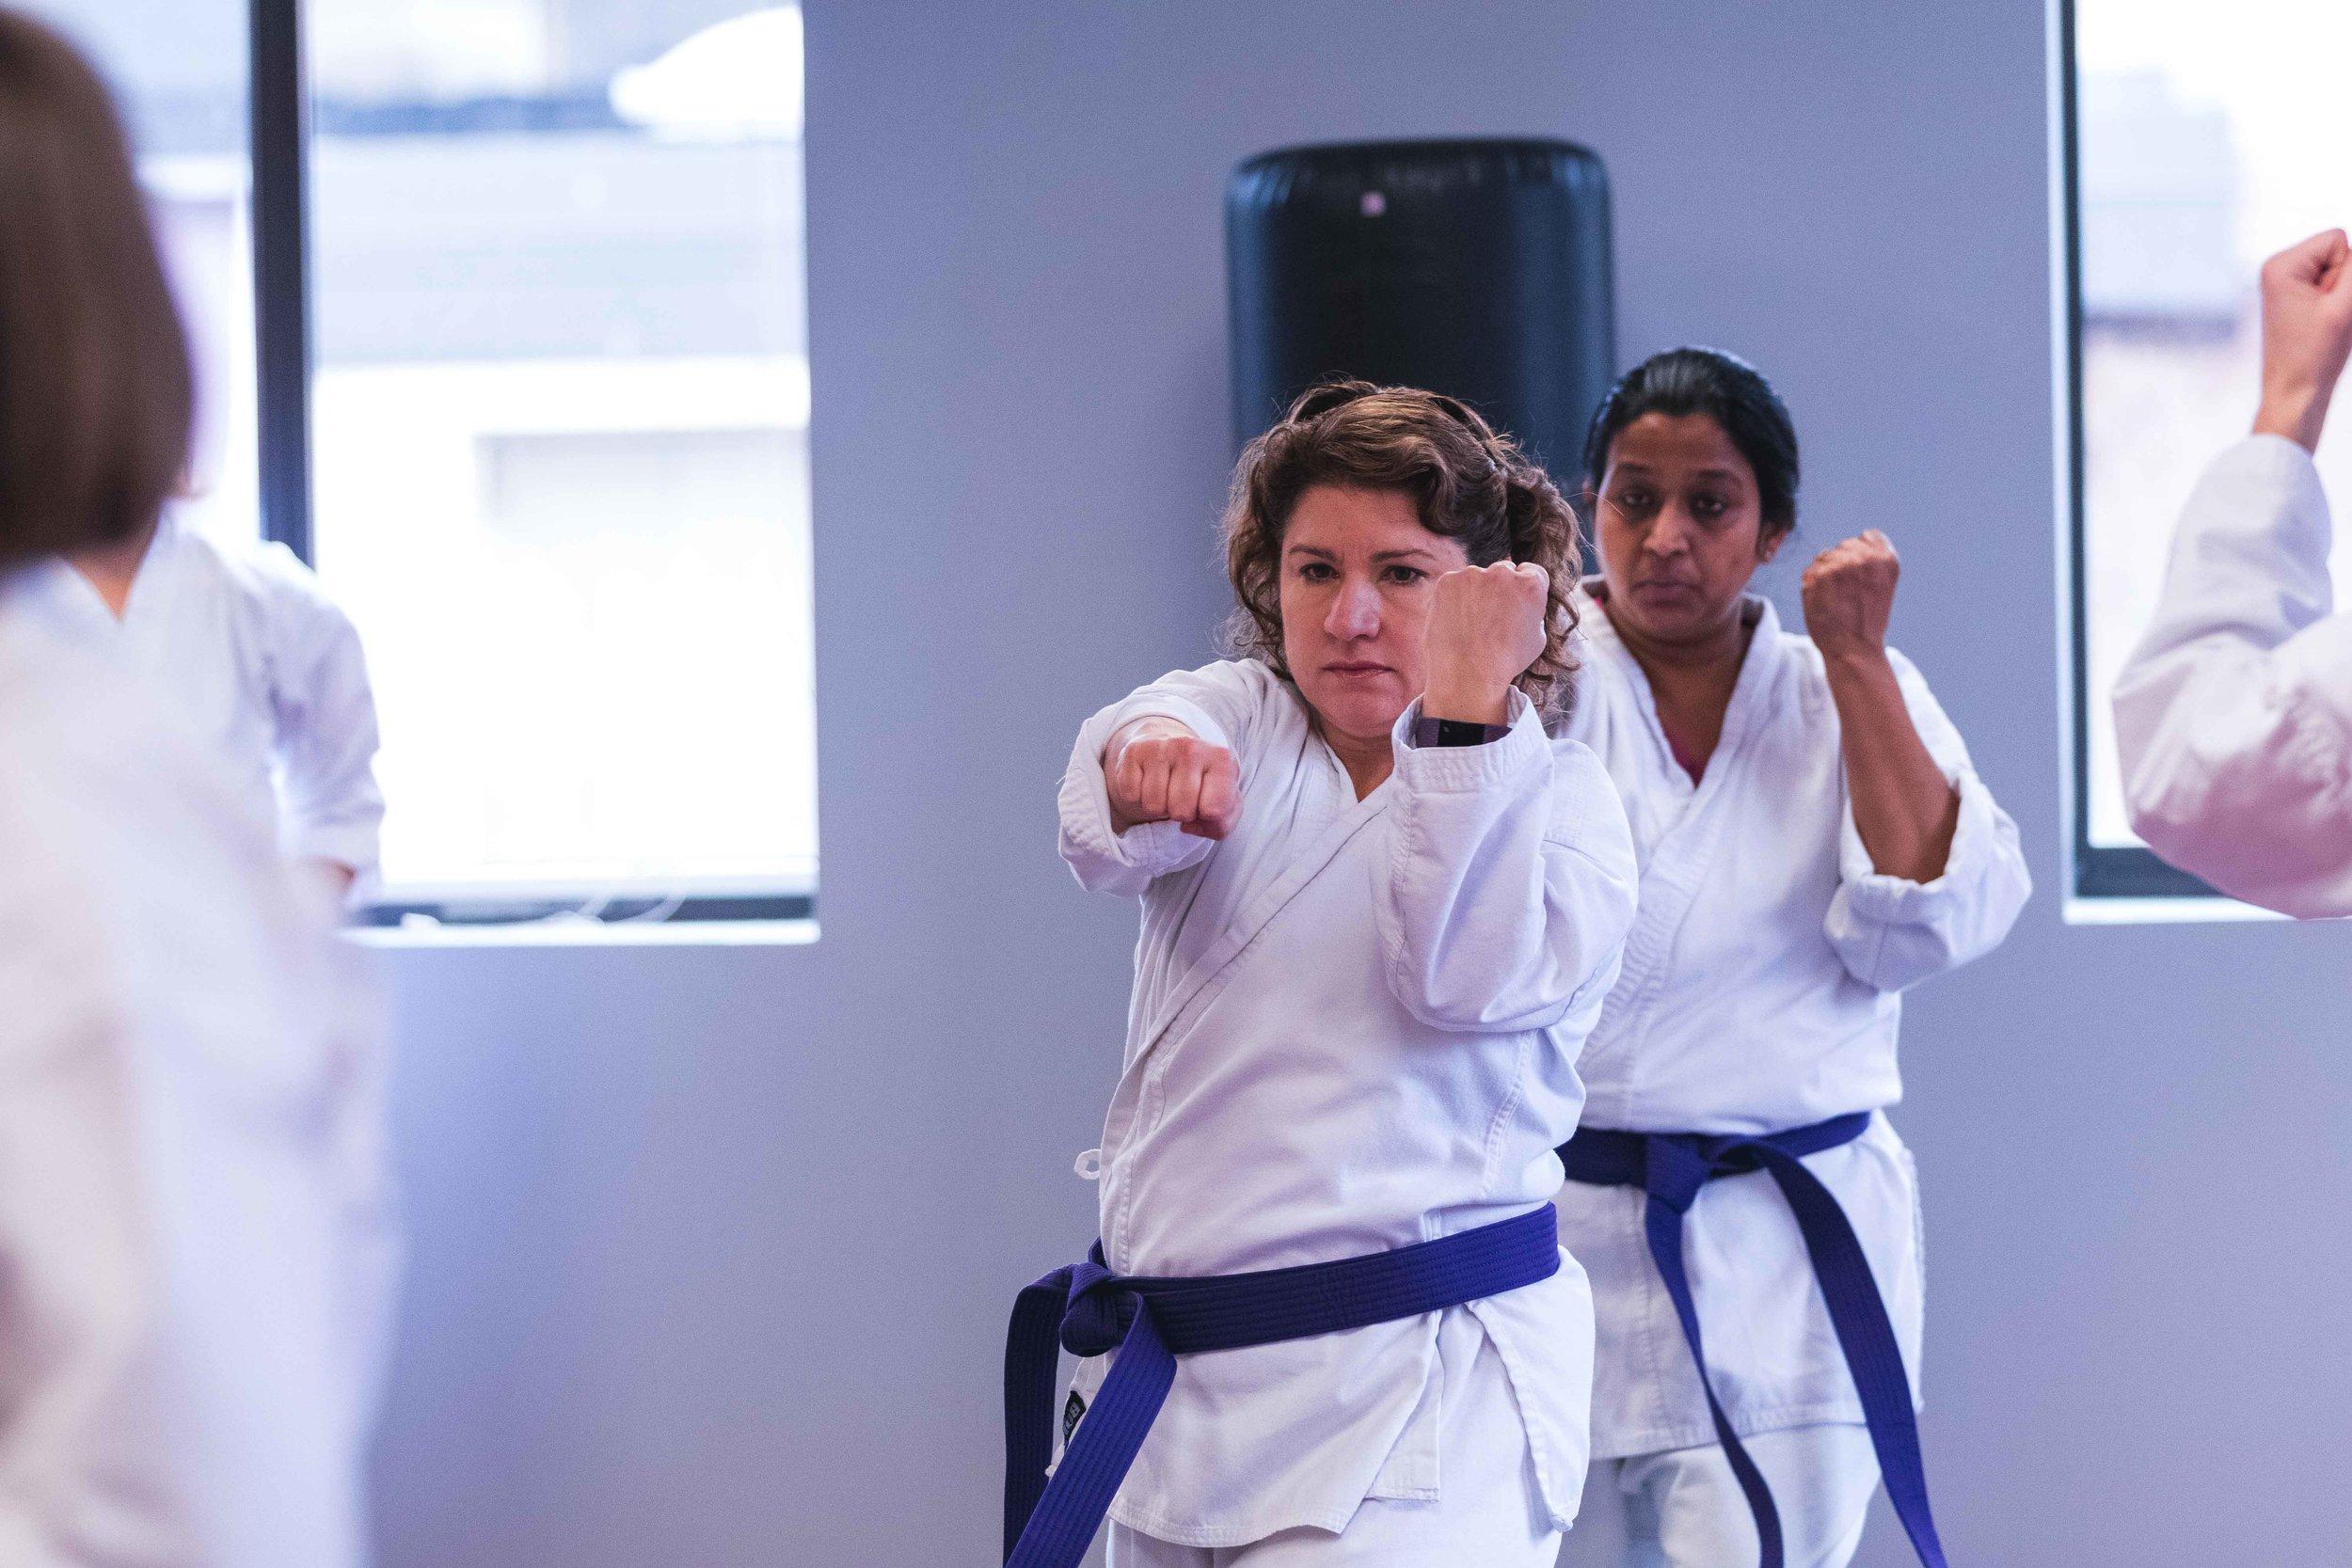 Self Defense Martial Arts Classes for Adult Men and Women in Bedford Massachusetts at Callahan's Karate.jpg